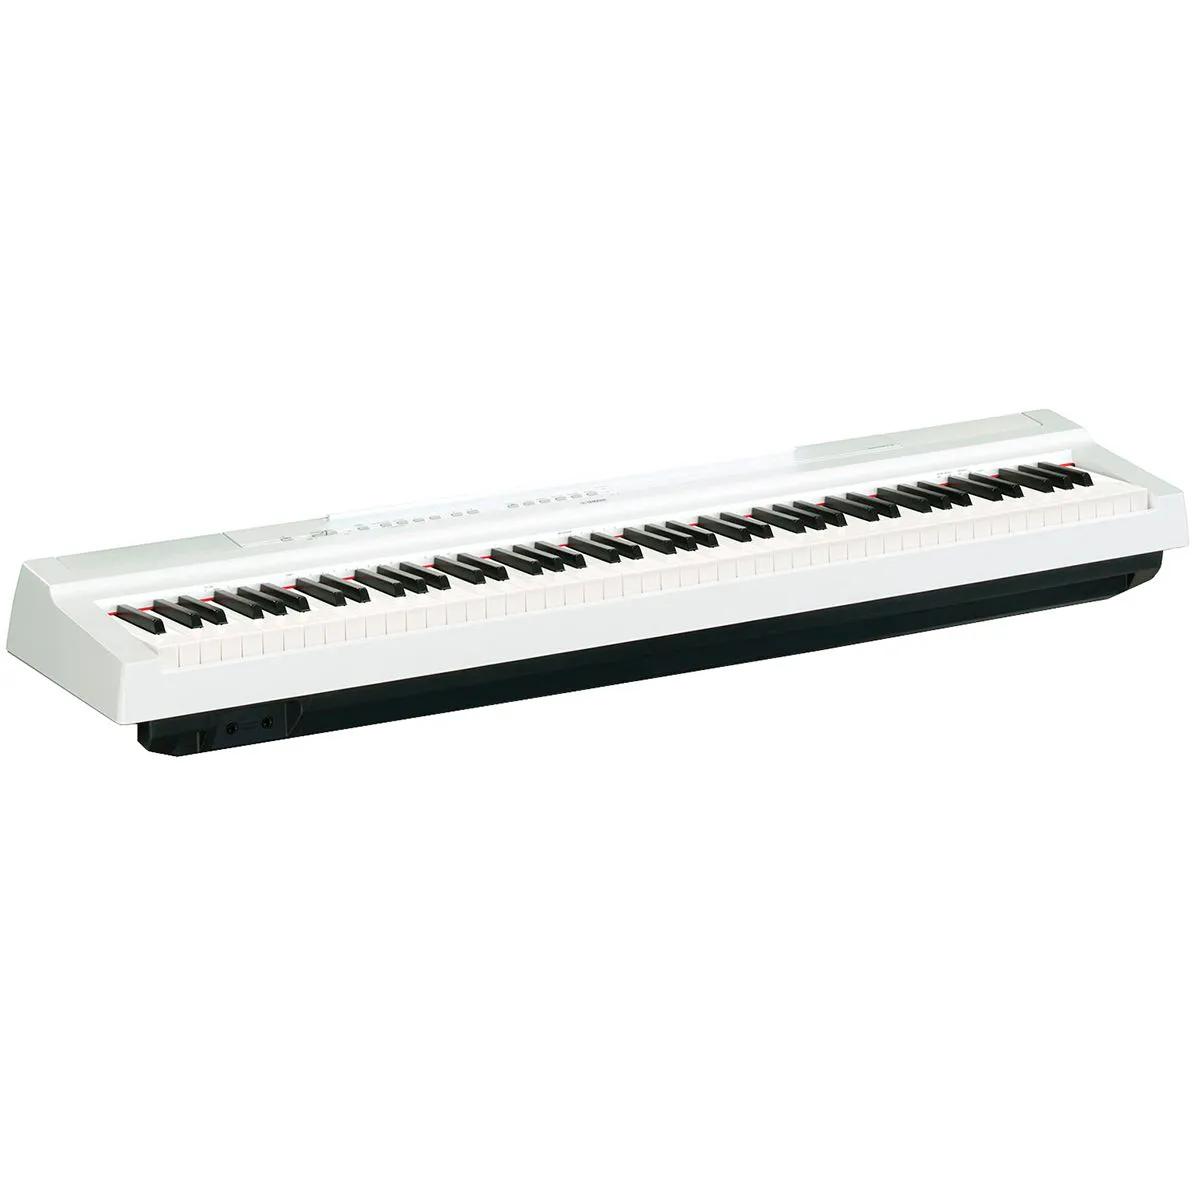 Piano Digital Yamaha P125 88 Teclas USB White